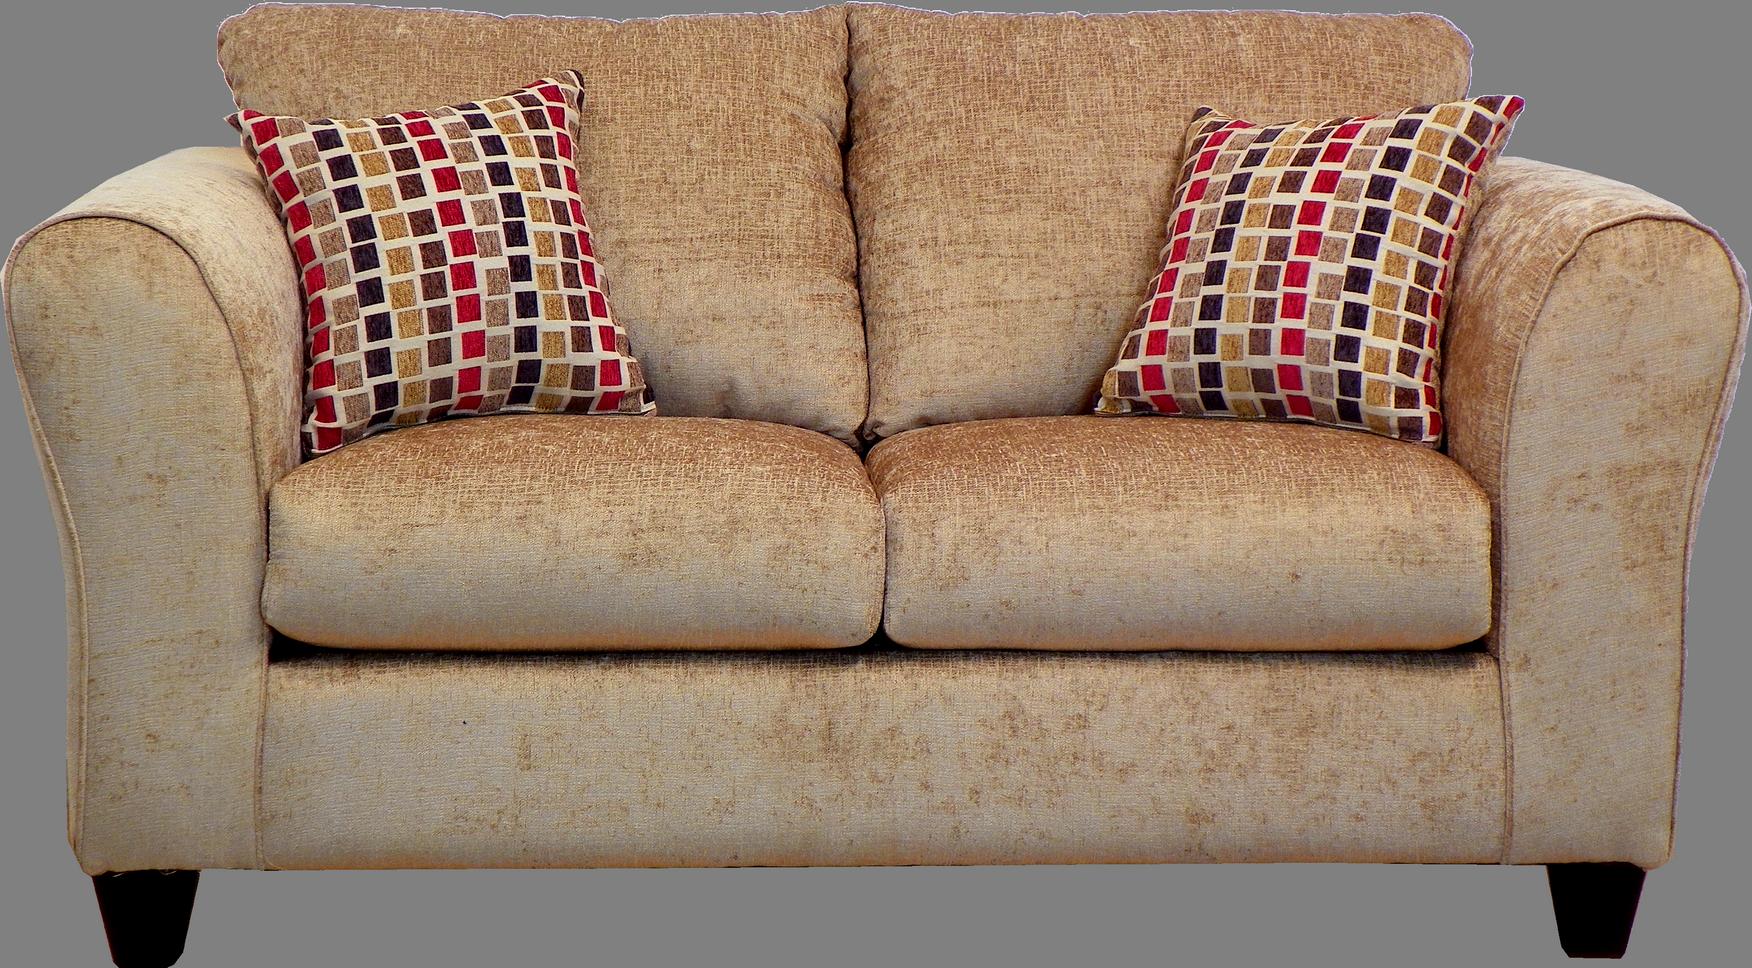 Sofa Png Image Furniture Arrangement Deck Furniture Rustic Living Room Furniture